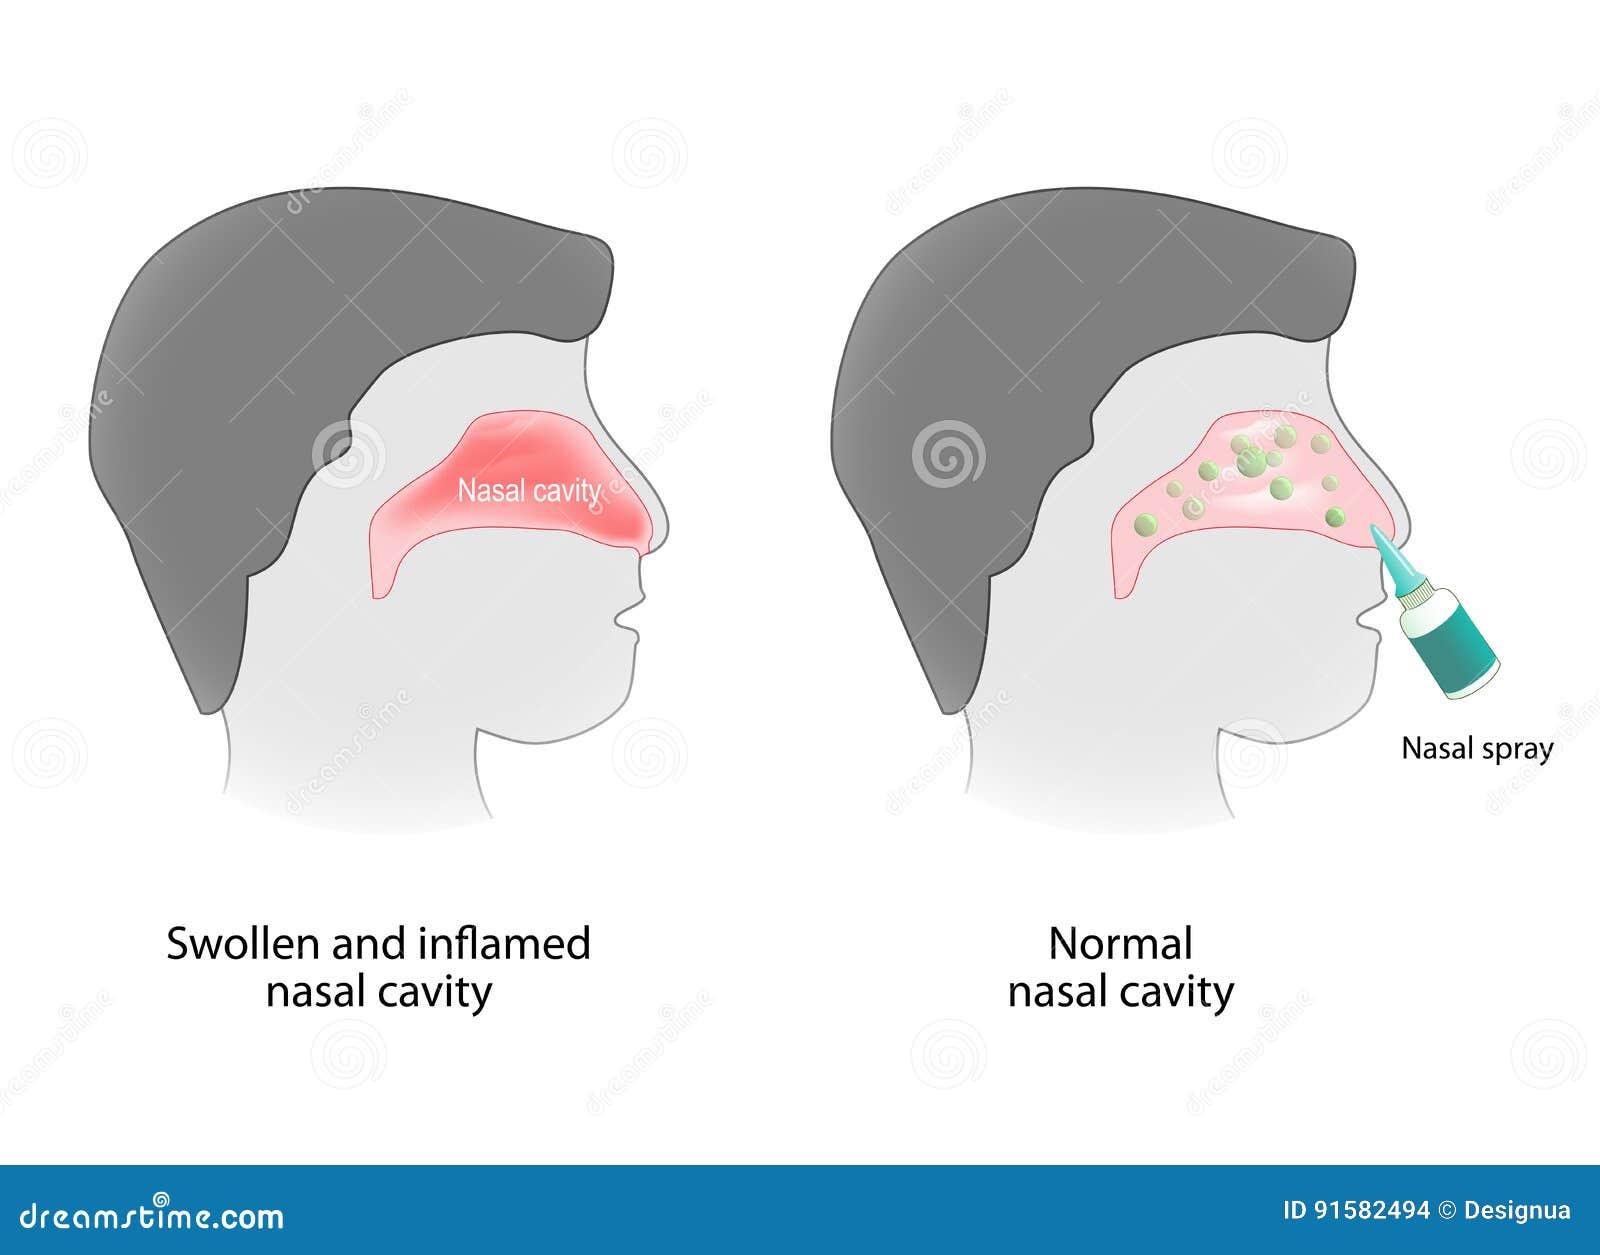 Inflammation Of The Nasal Cavity And Nasal Cavity Healthy Stock ...